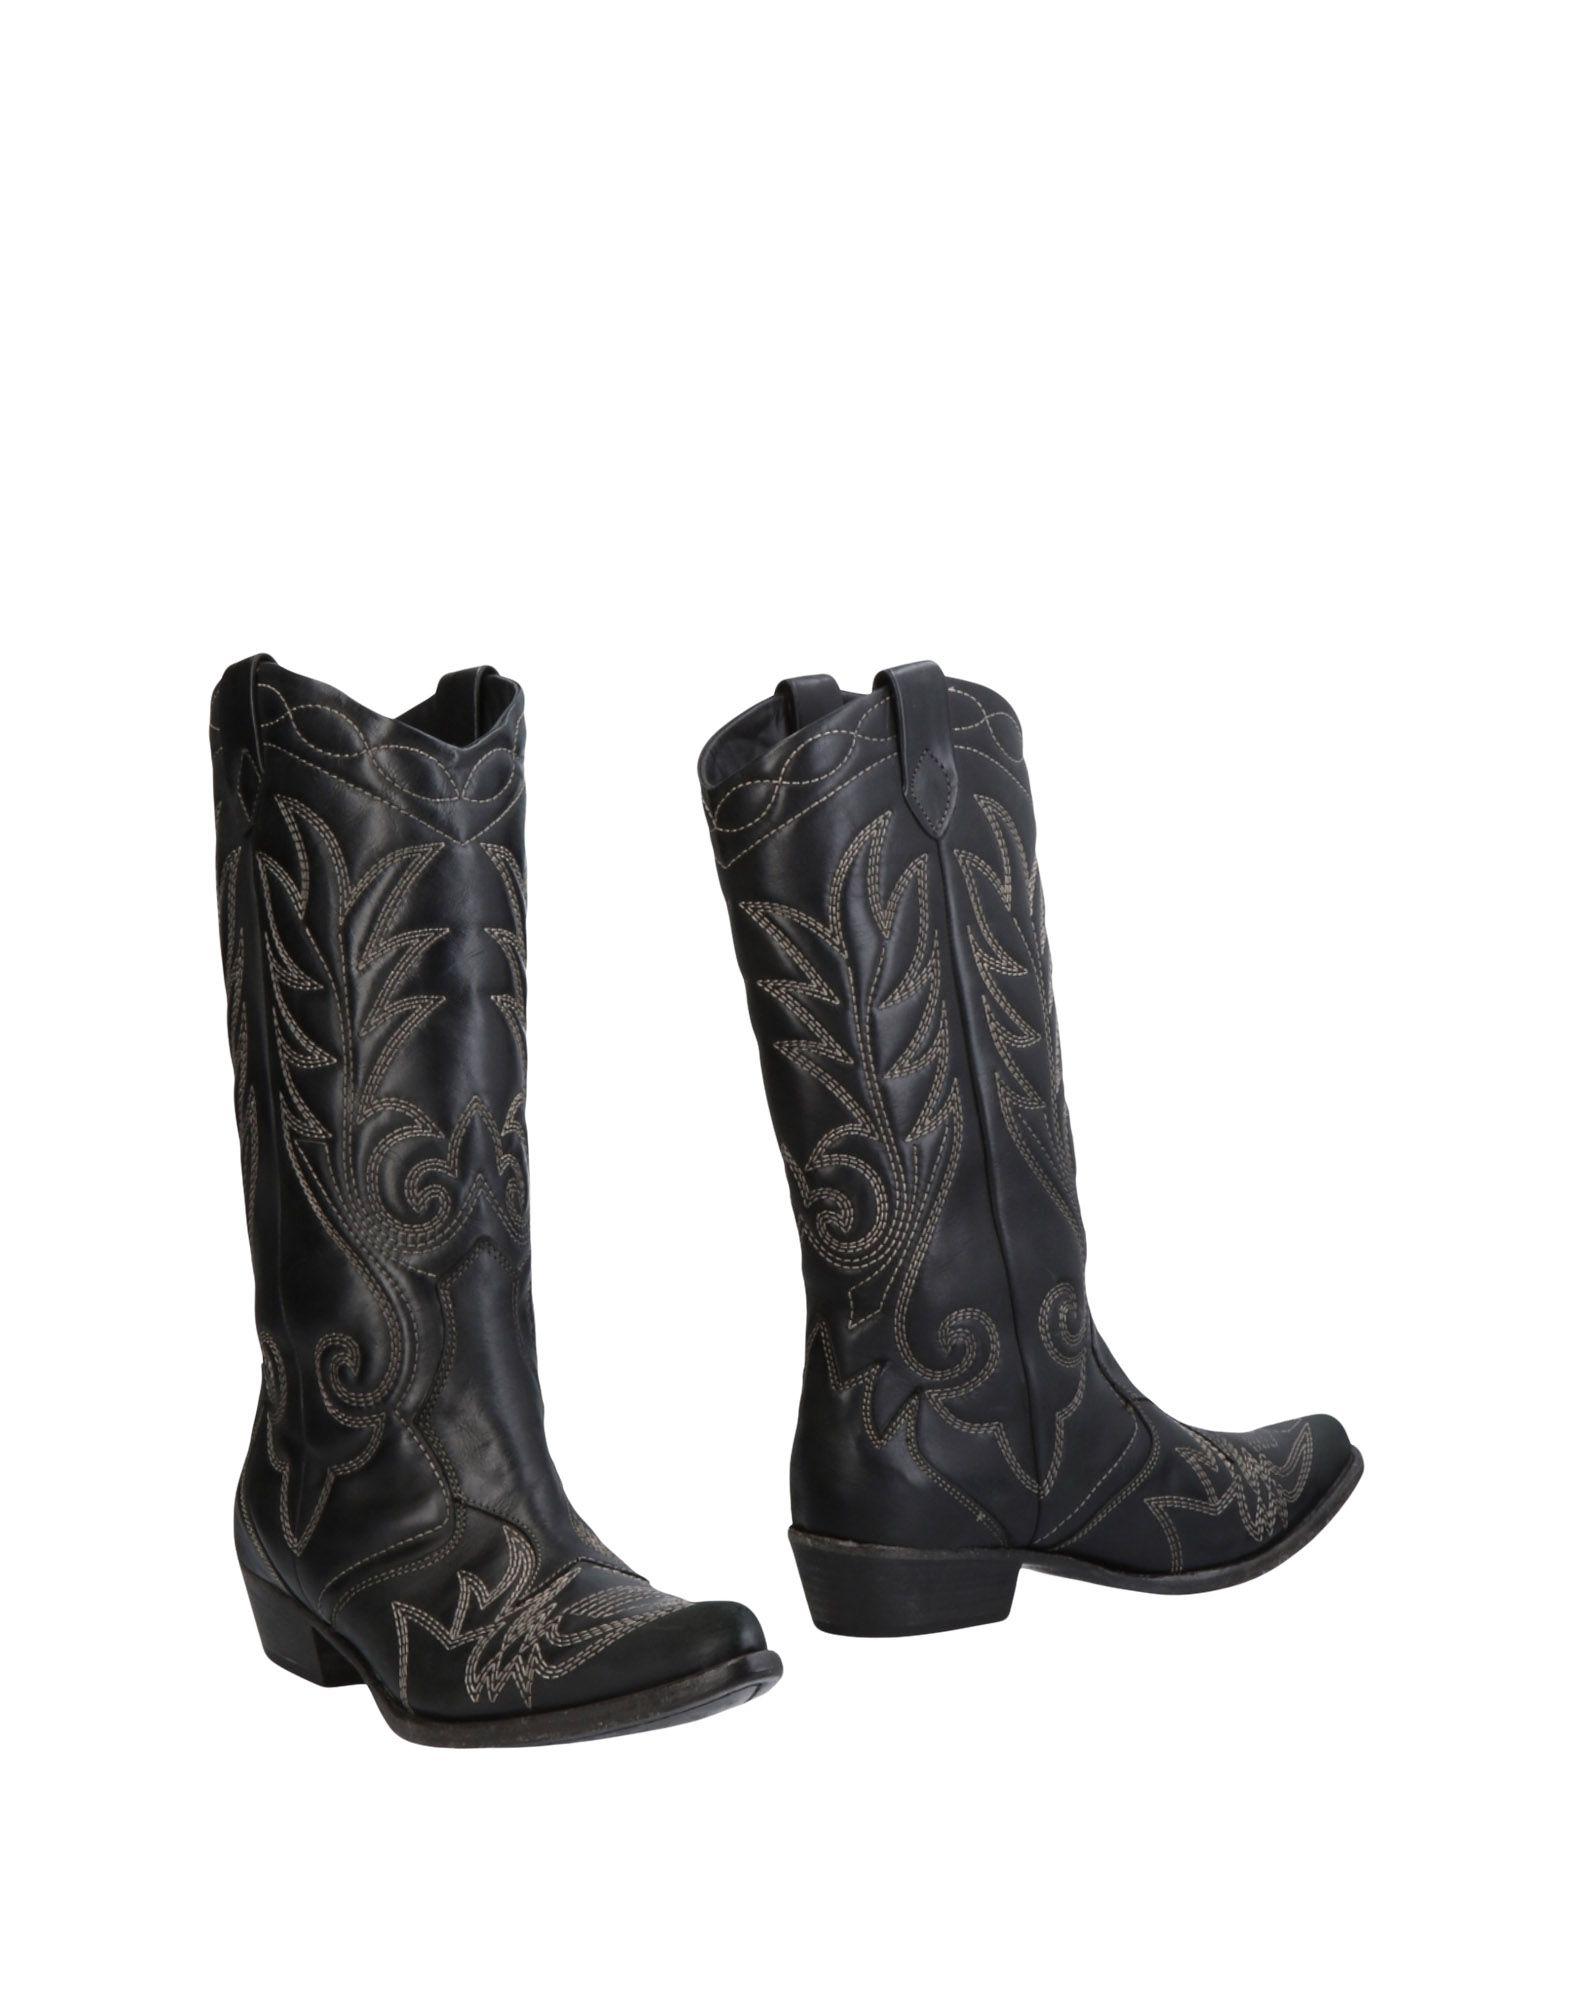 Materia Prima By Goffredo Fantini Stiefel Damen  11463522EMGut aussehende strapazierfähige Schuhe